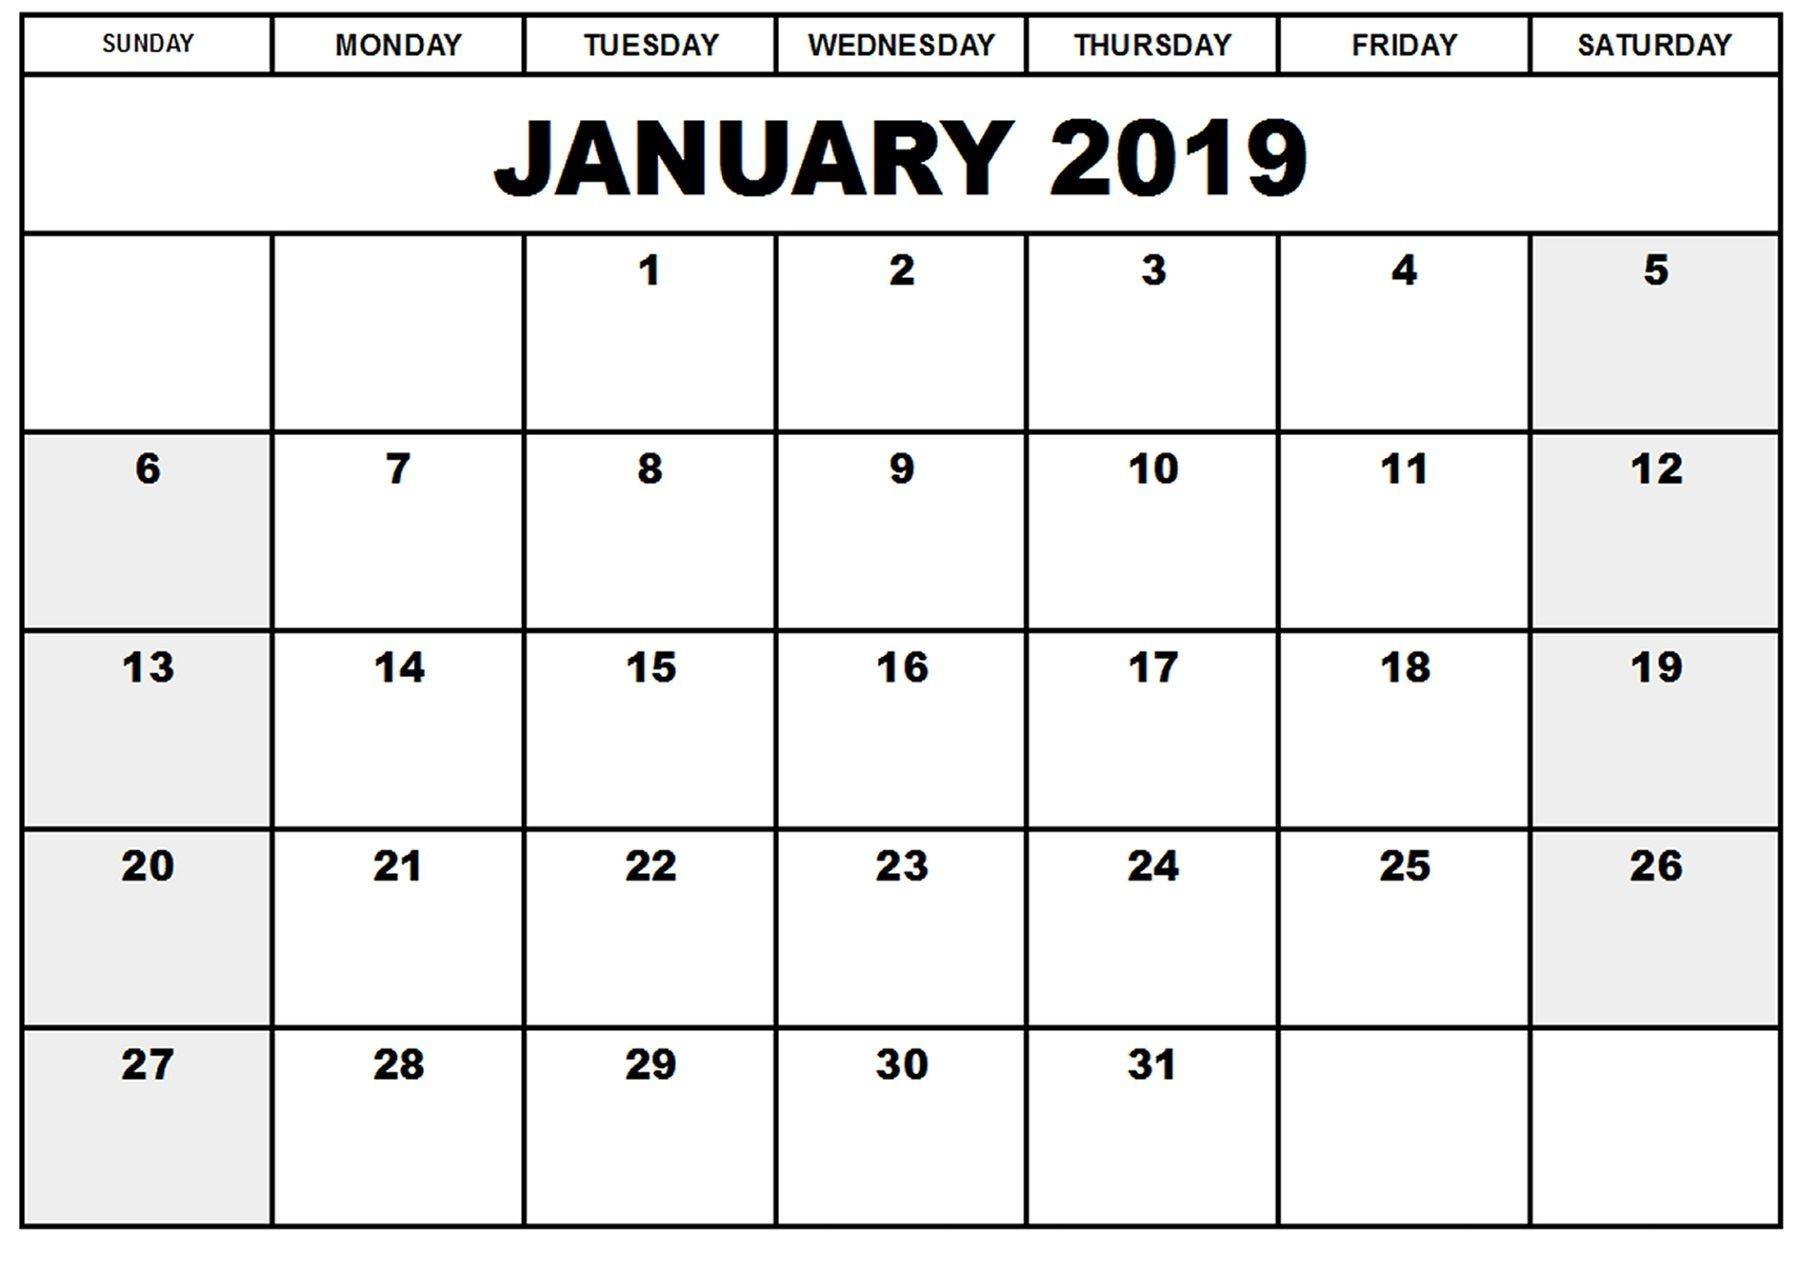 Printable Calendar January 2019 | Blank January 2019 Calendar  Free Printable 12 Month Blank Calendar